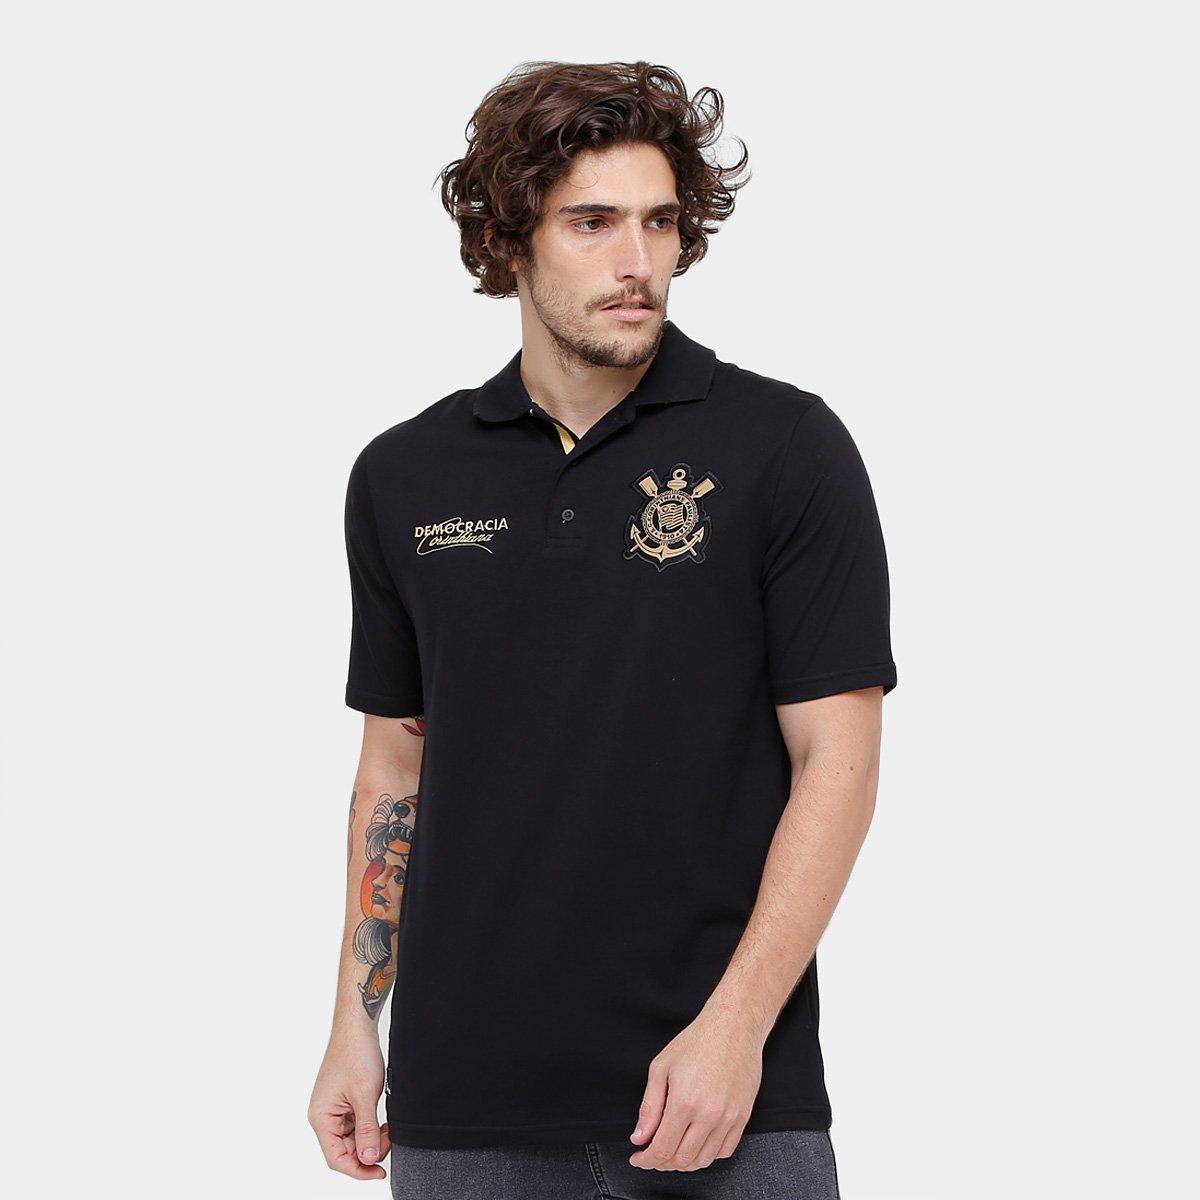 Camisa Polo Corinthians Democracia Corintiana Sócrates Masculina - Preto 0dfec2daf63a7